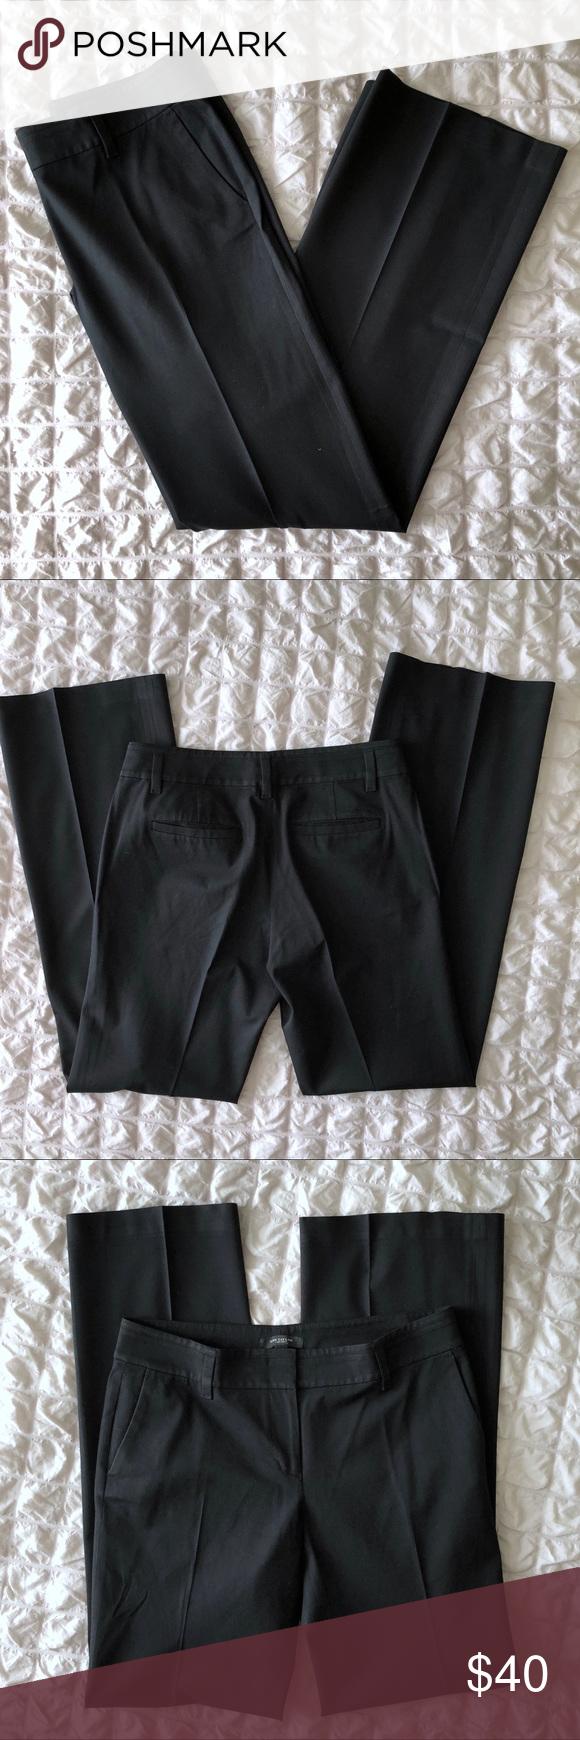 Ann Taylor Black Dress Pants 6 Tall Flattering Fashion Black Dress Pants Clothes Design [ 1740 x 580 Pixel ]